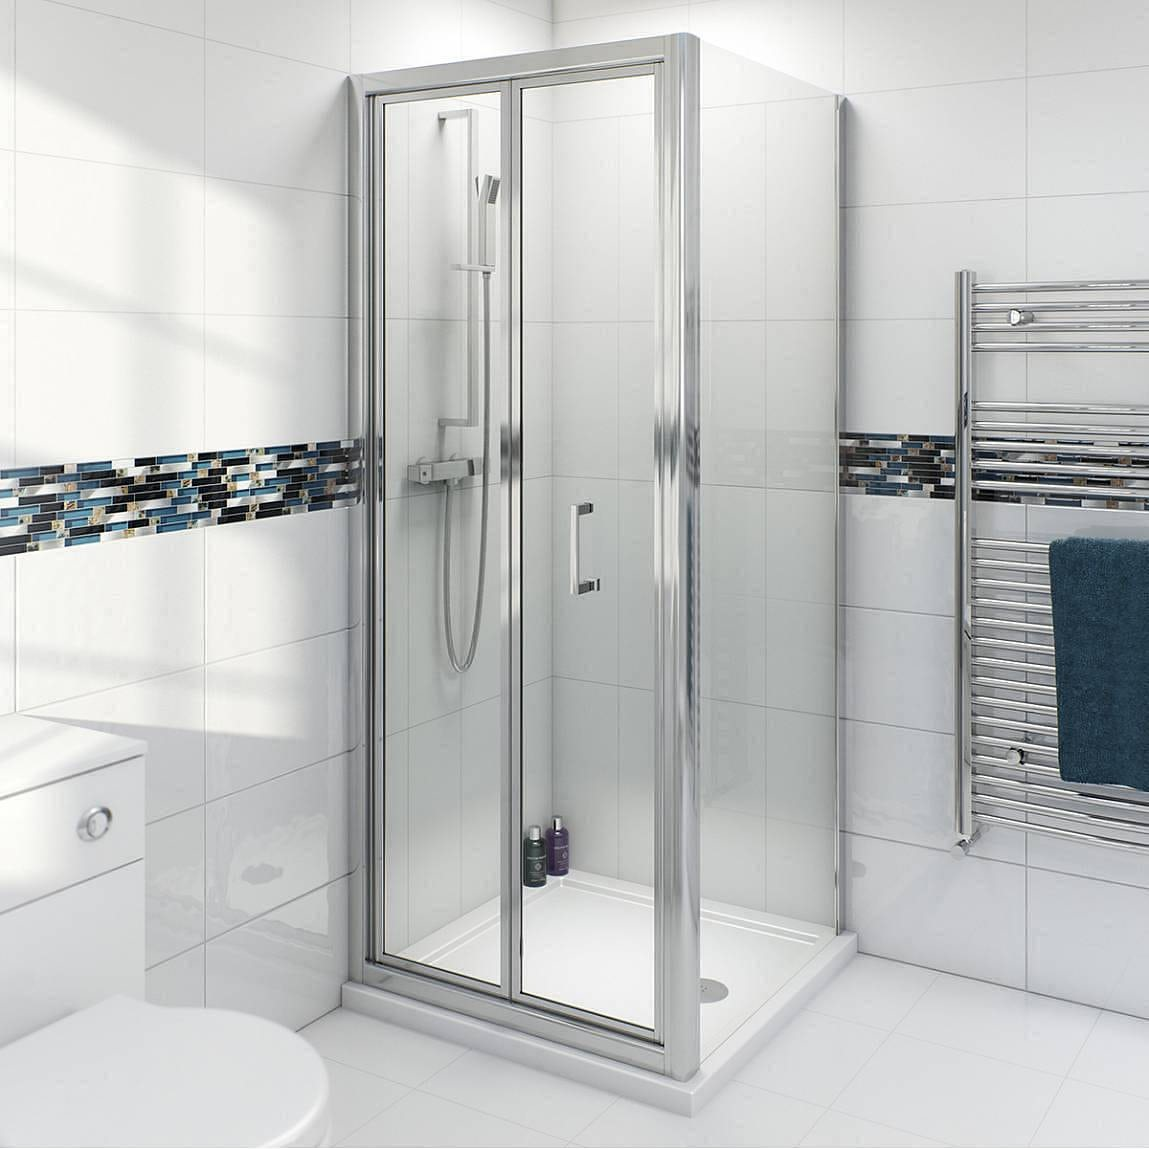 4mm bifold shower enclosure 800 x 1000 special offer for 1000 bifold shower door